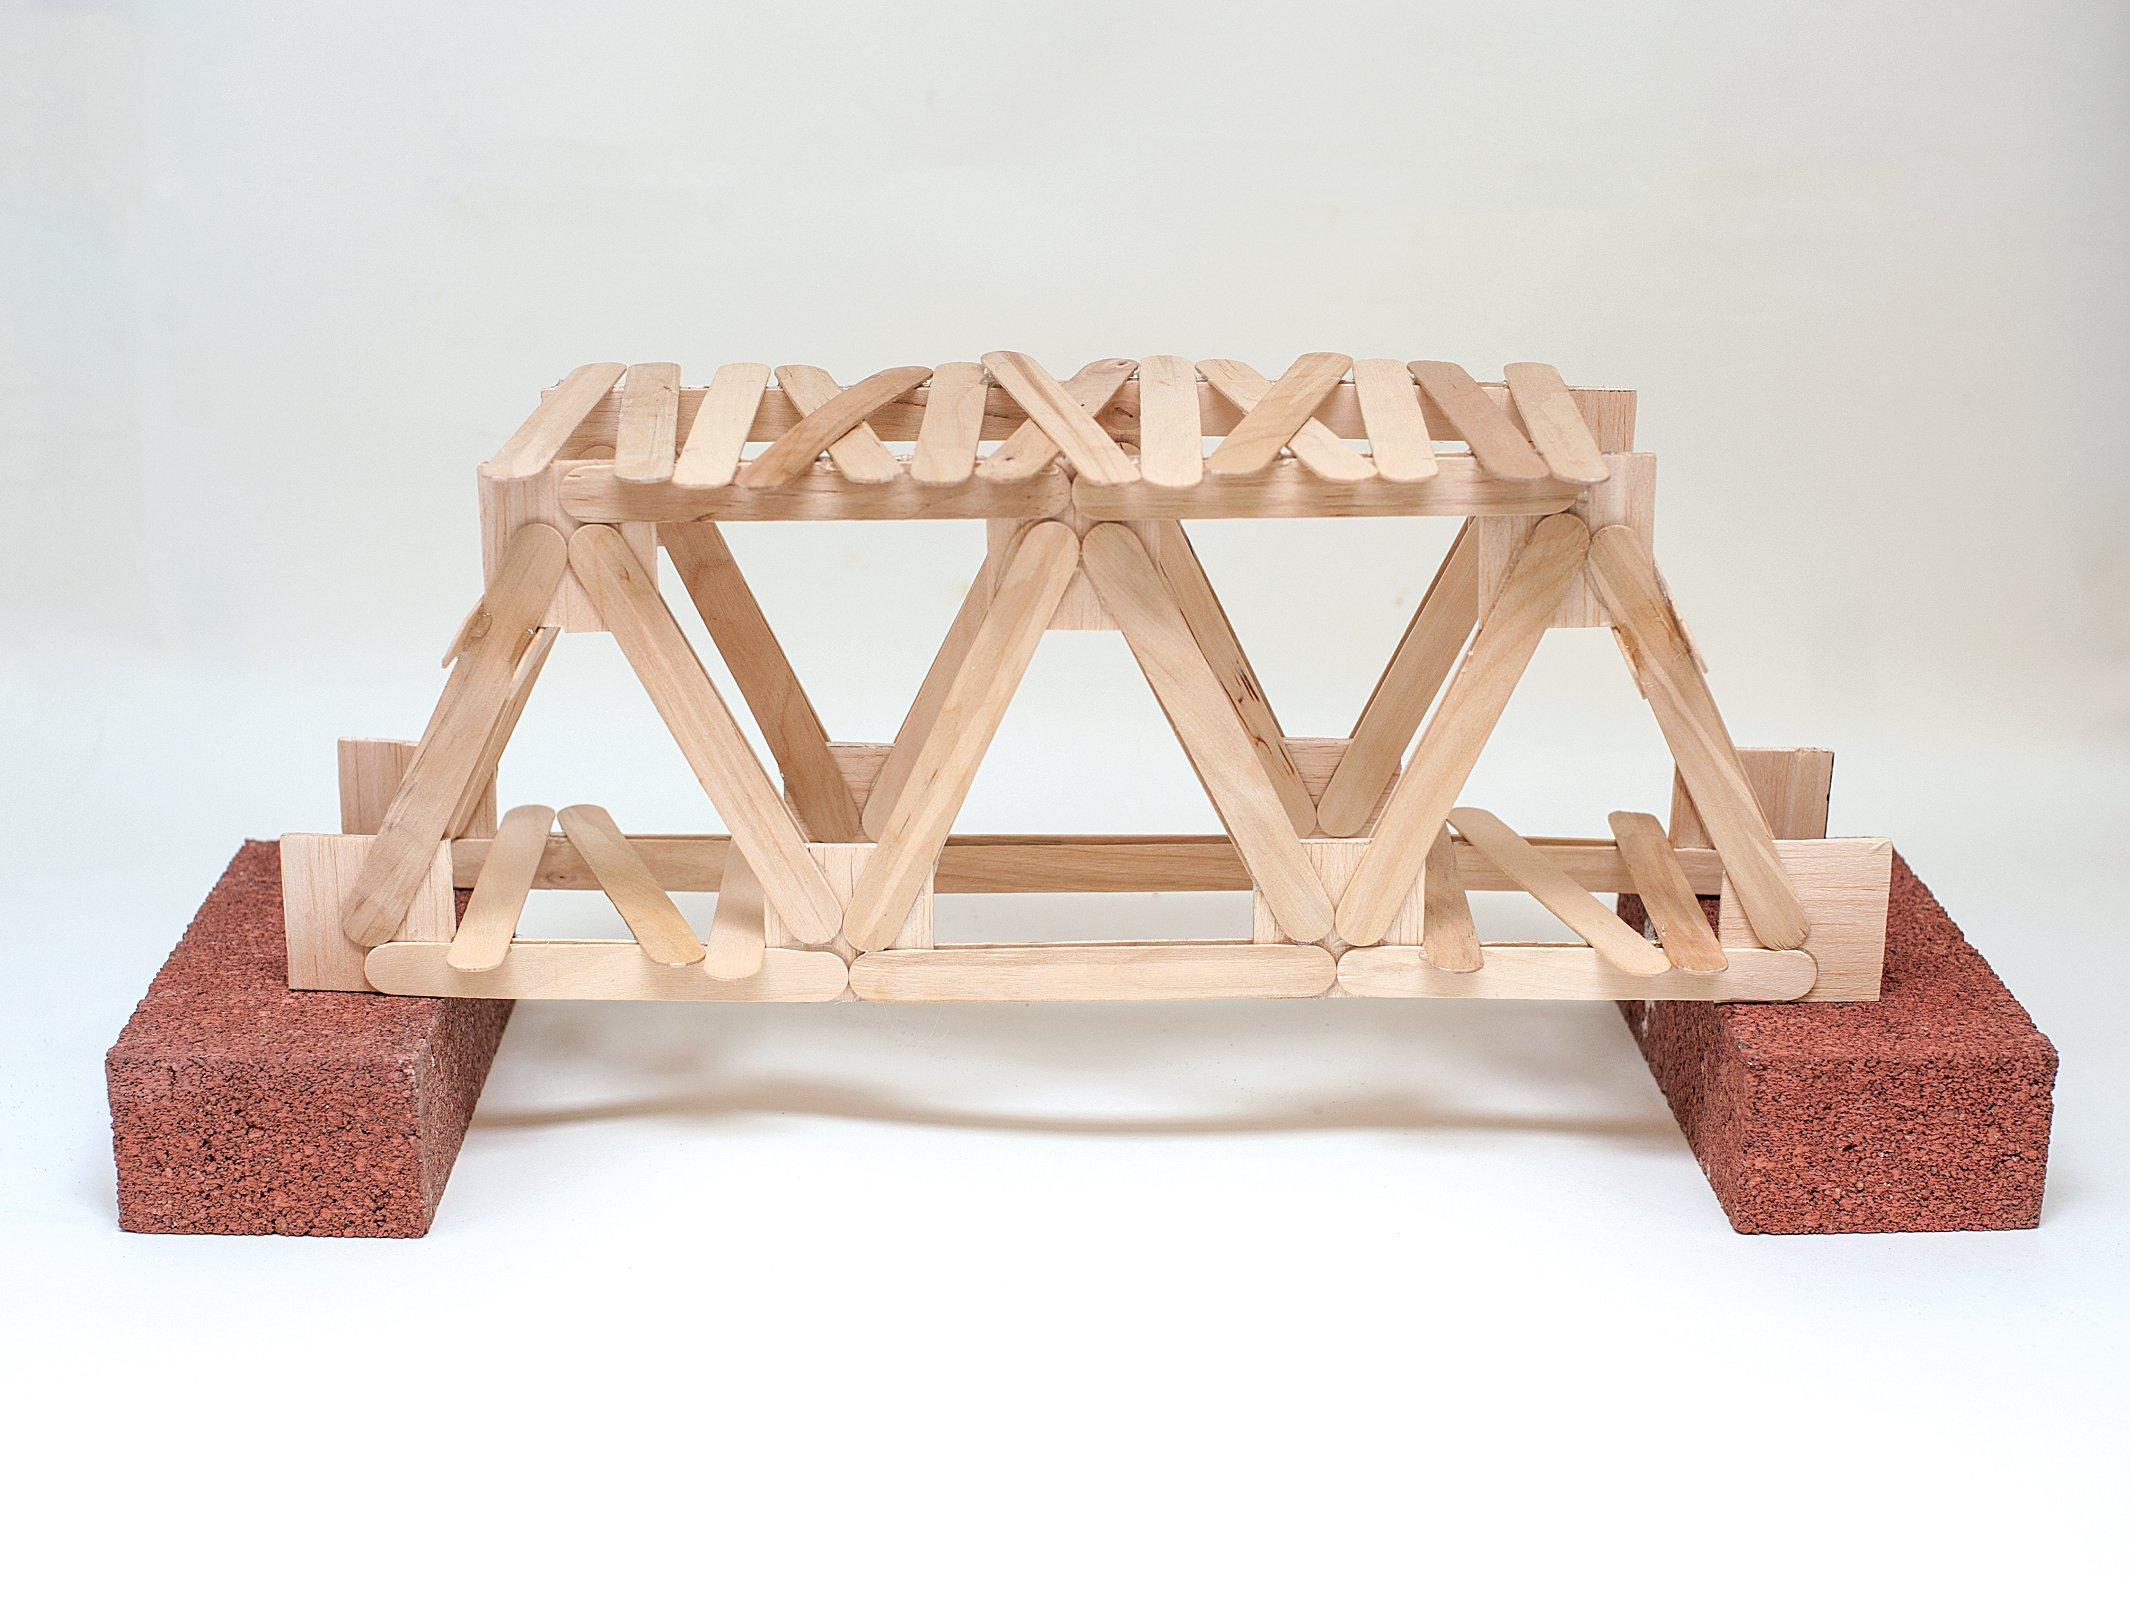 Popsicle Stick Bridge on 1st Grade Science Project Ideas